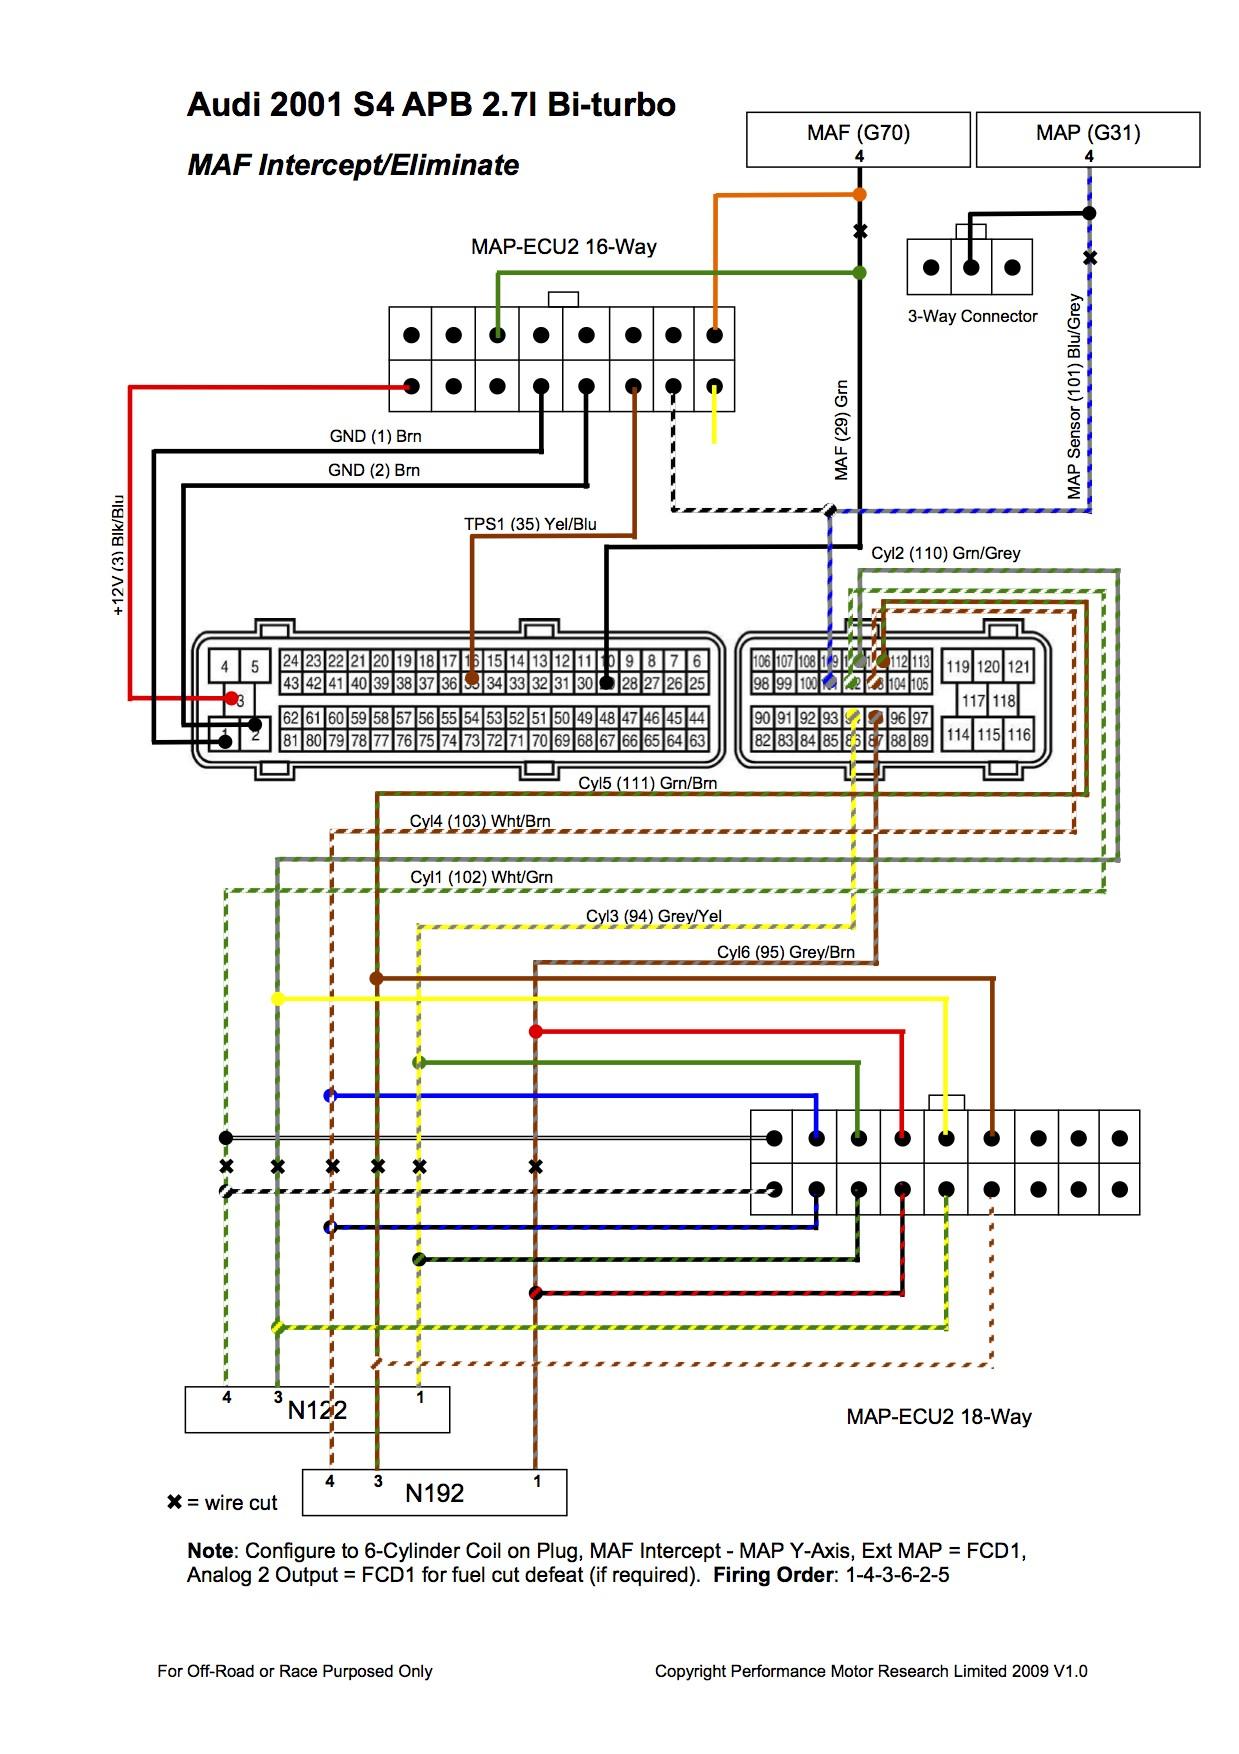 detroit diesel series 60 ecm wiring diagram new wiring diagram image rh mainetreasurechest com